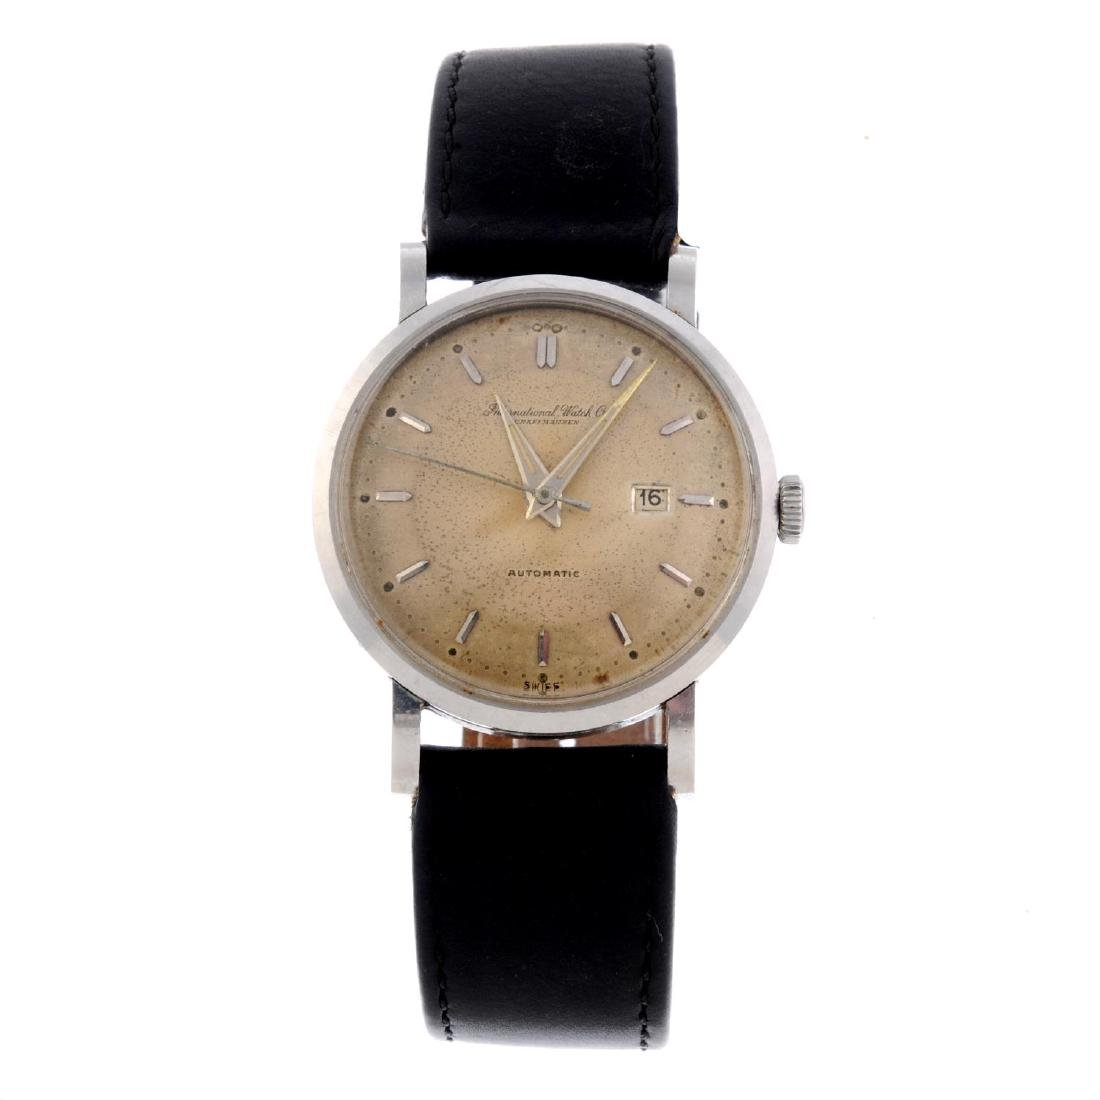 IWC - a gentleman's wrist watch. Stainless steel case.